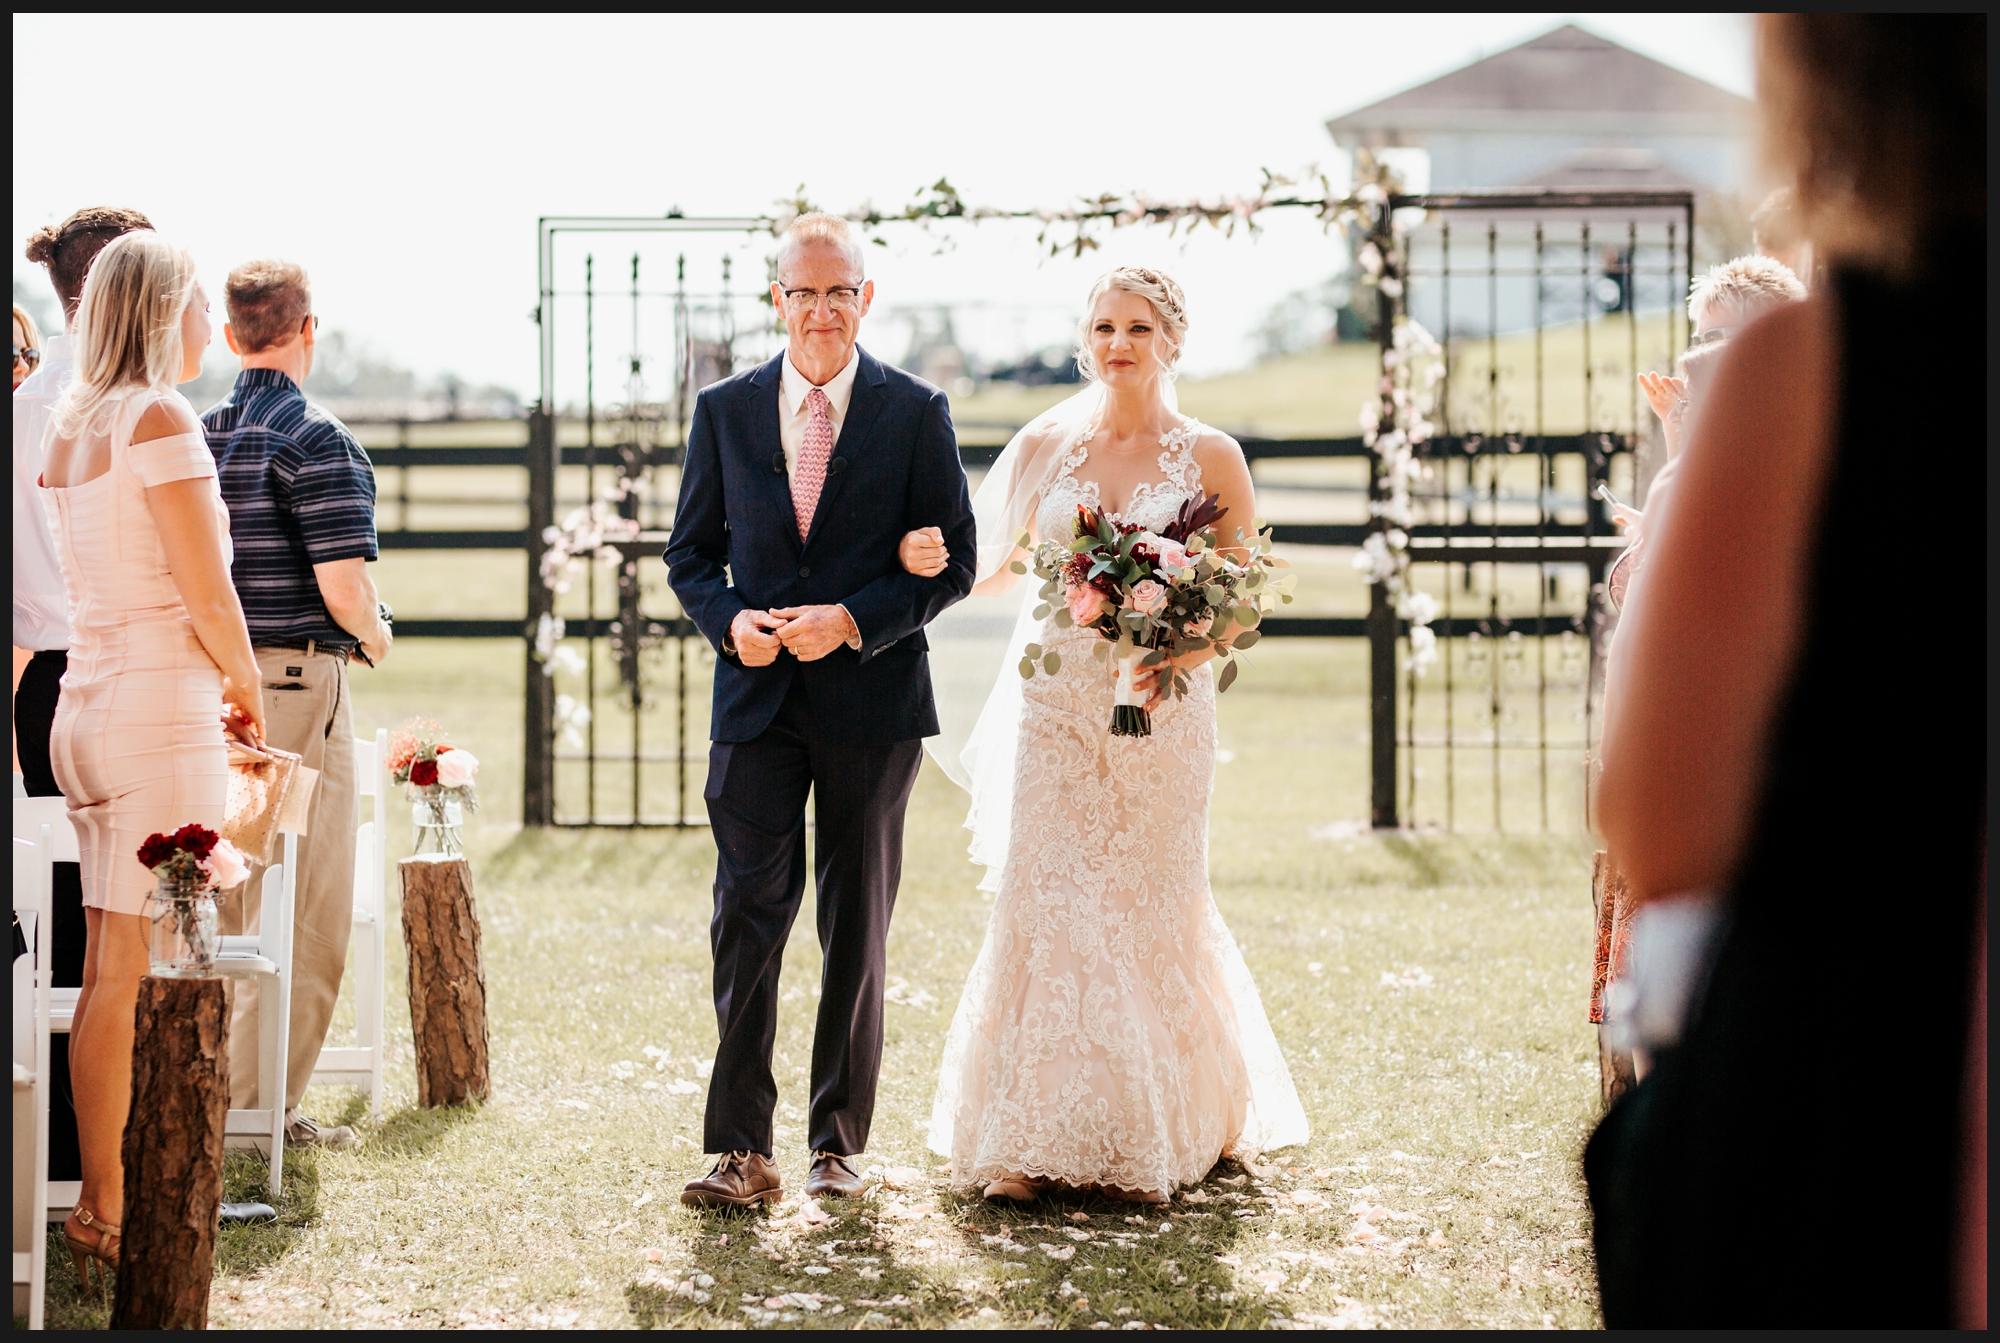 Orlando-Wedding-Photographer-destination-wedding-photographer-florida-wedding-photographer-hawaii-wedding-photographer_0592.jpg